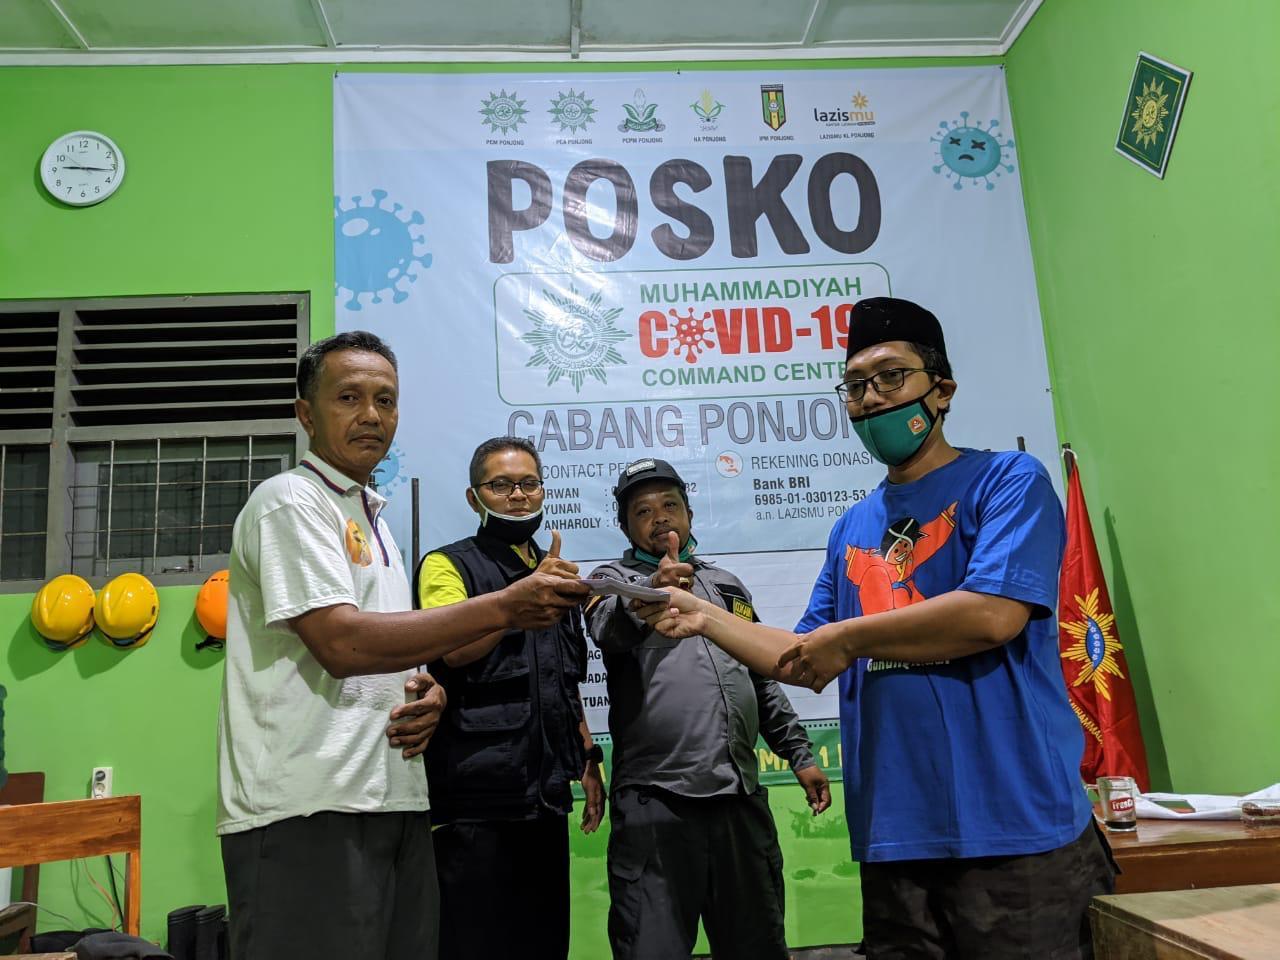 Donasi dari Pak Gandung Pardiman dI terima Ketua MCCC Cabang Ponjong Ustadz Irwan Triyanto